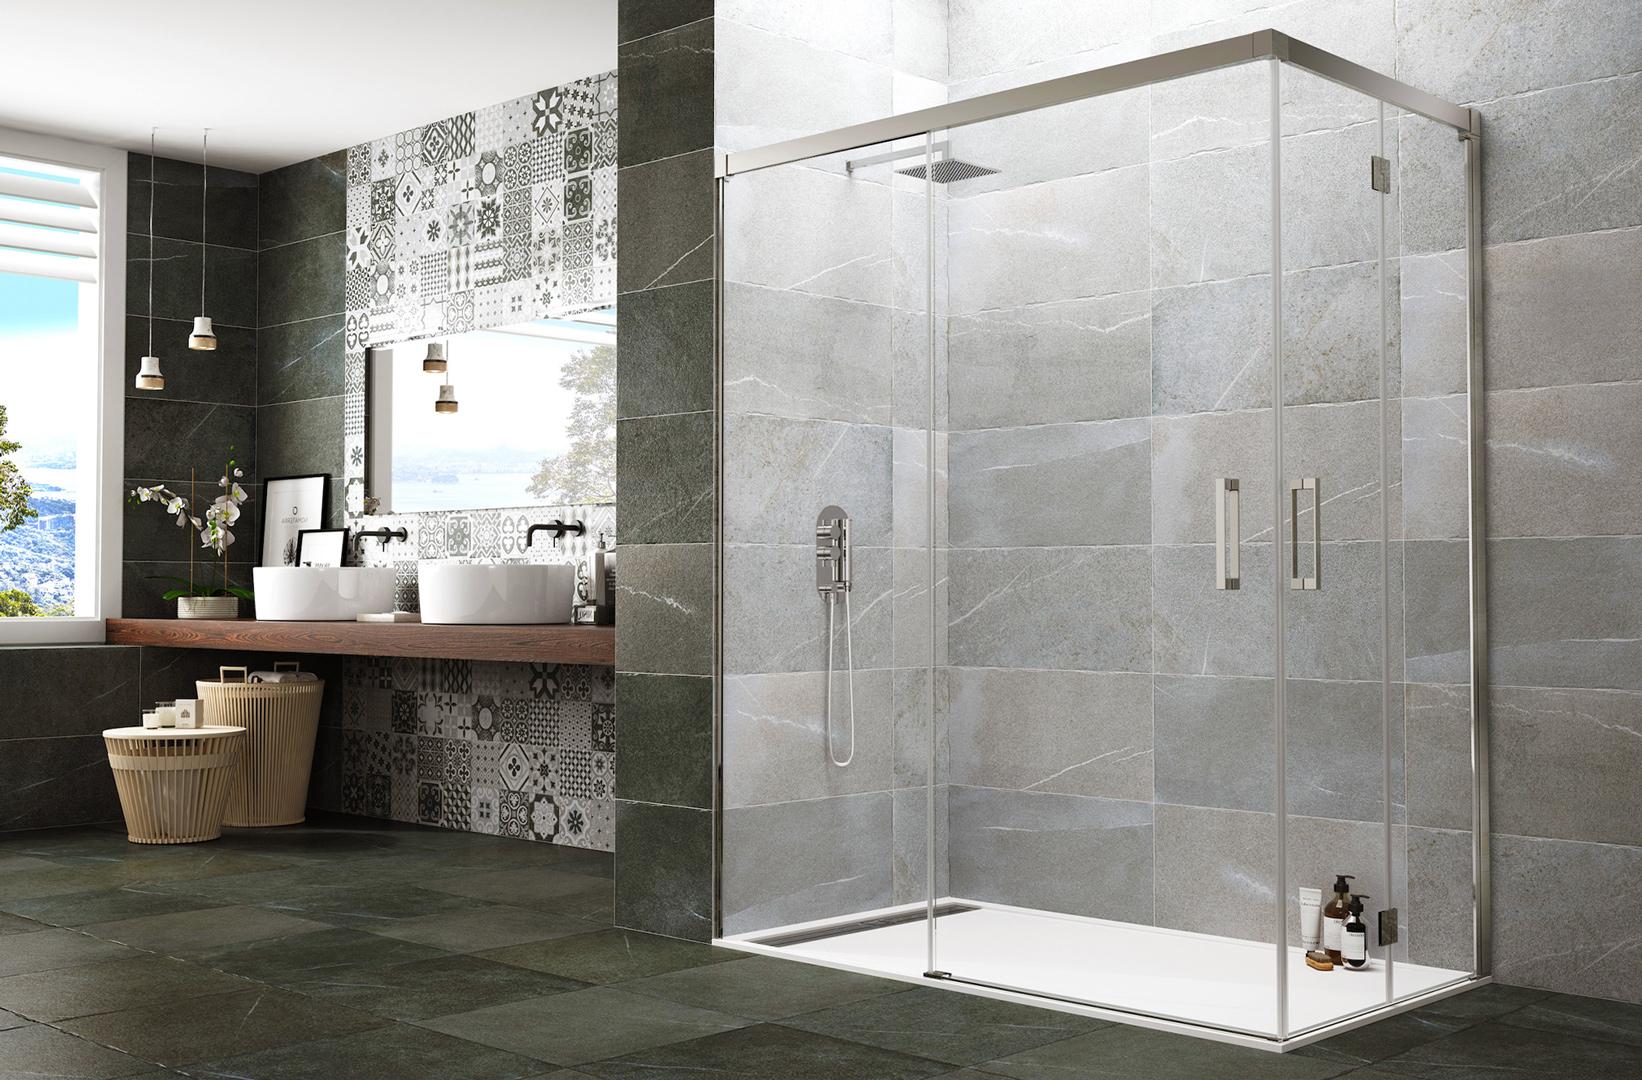 Espacio de baño